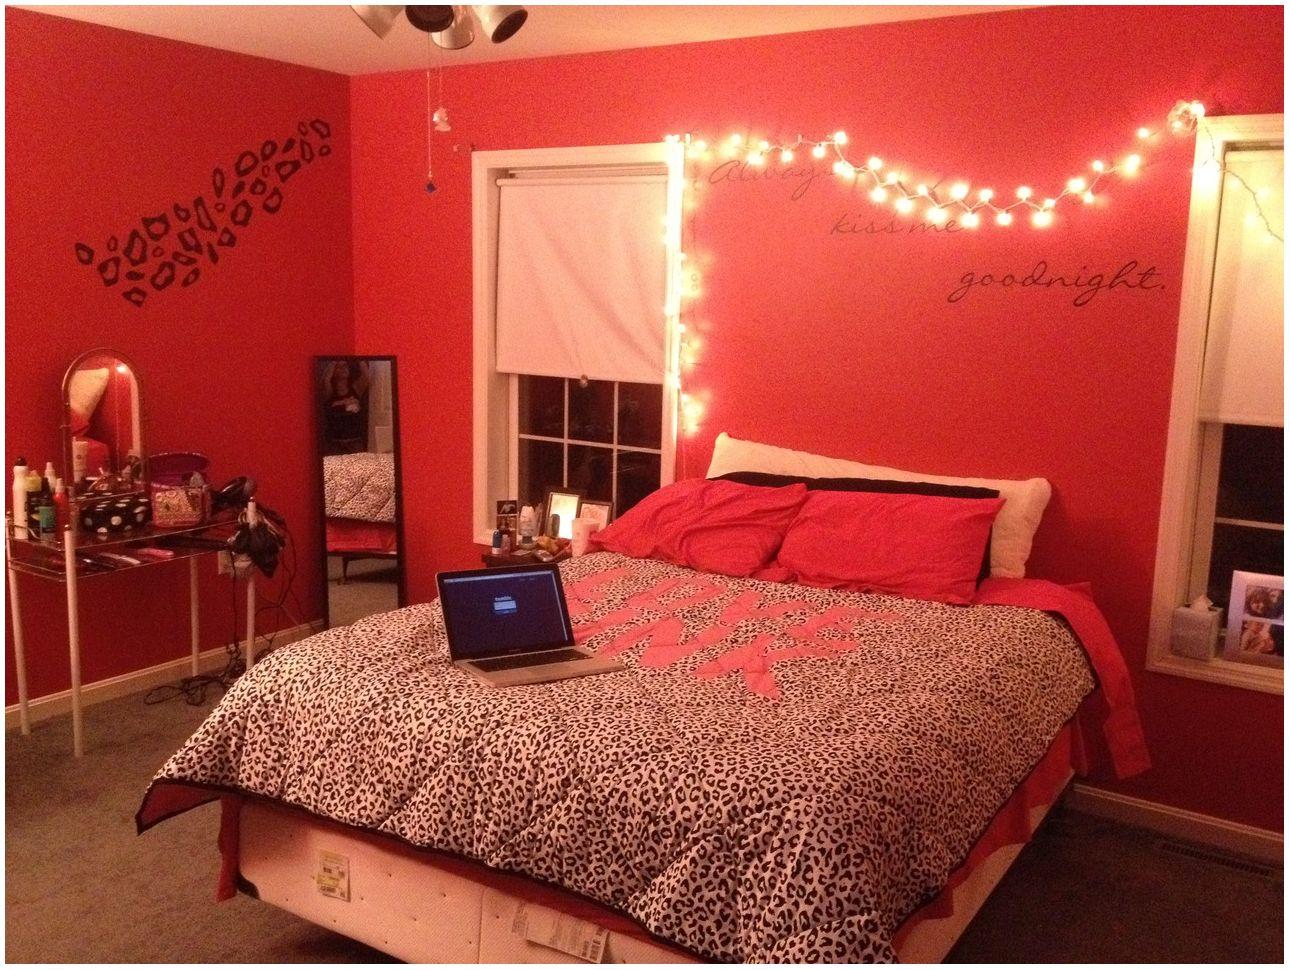 Elegant Red Bedroom Walls Of Amazing Cheetah Print And Video